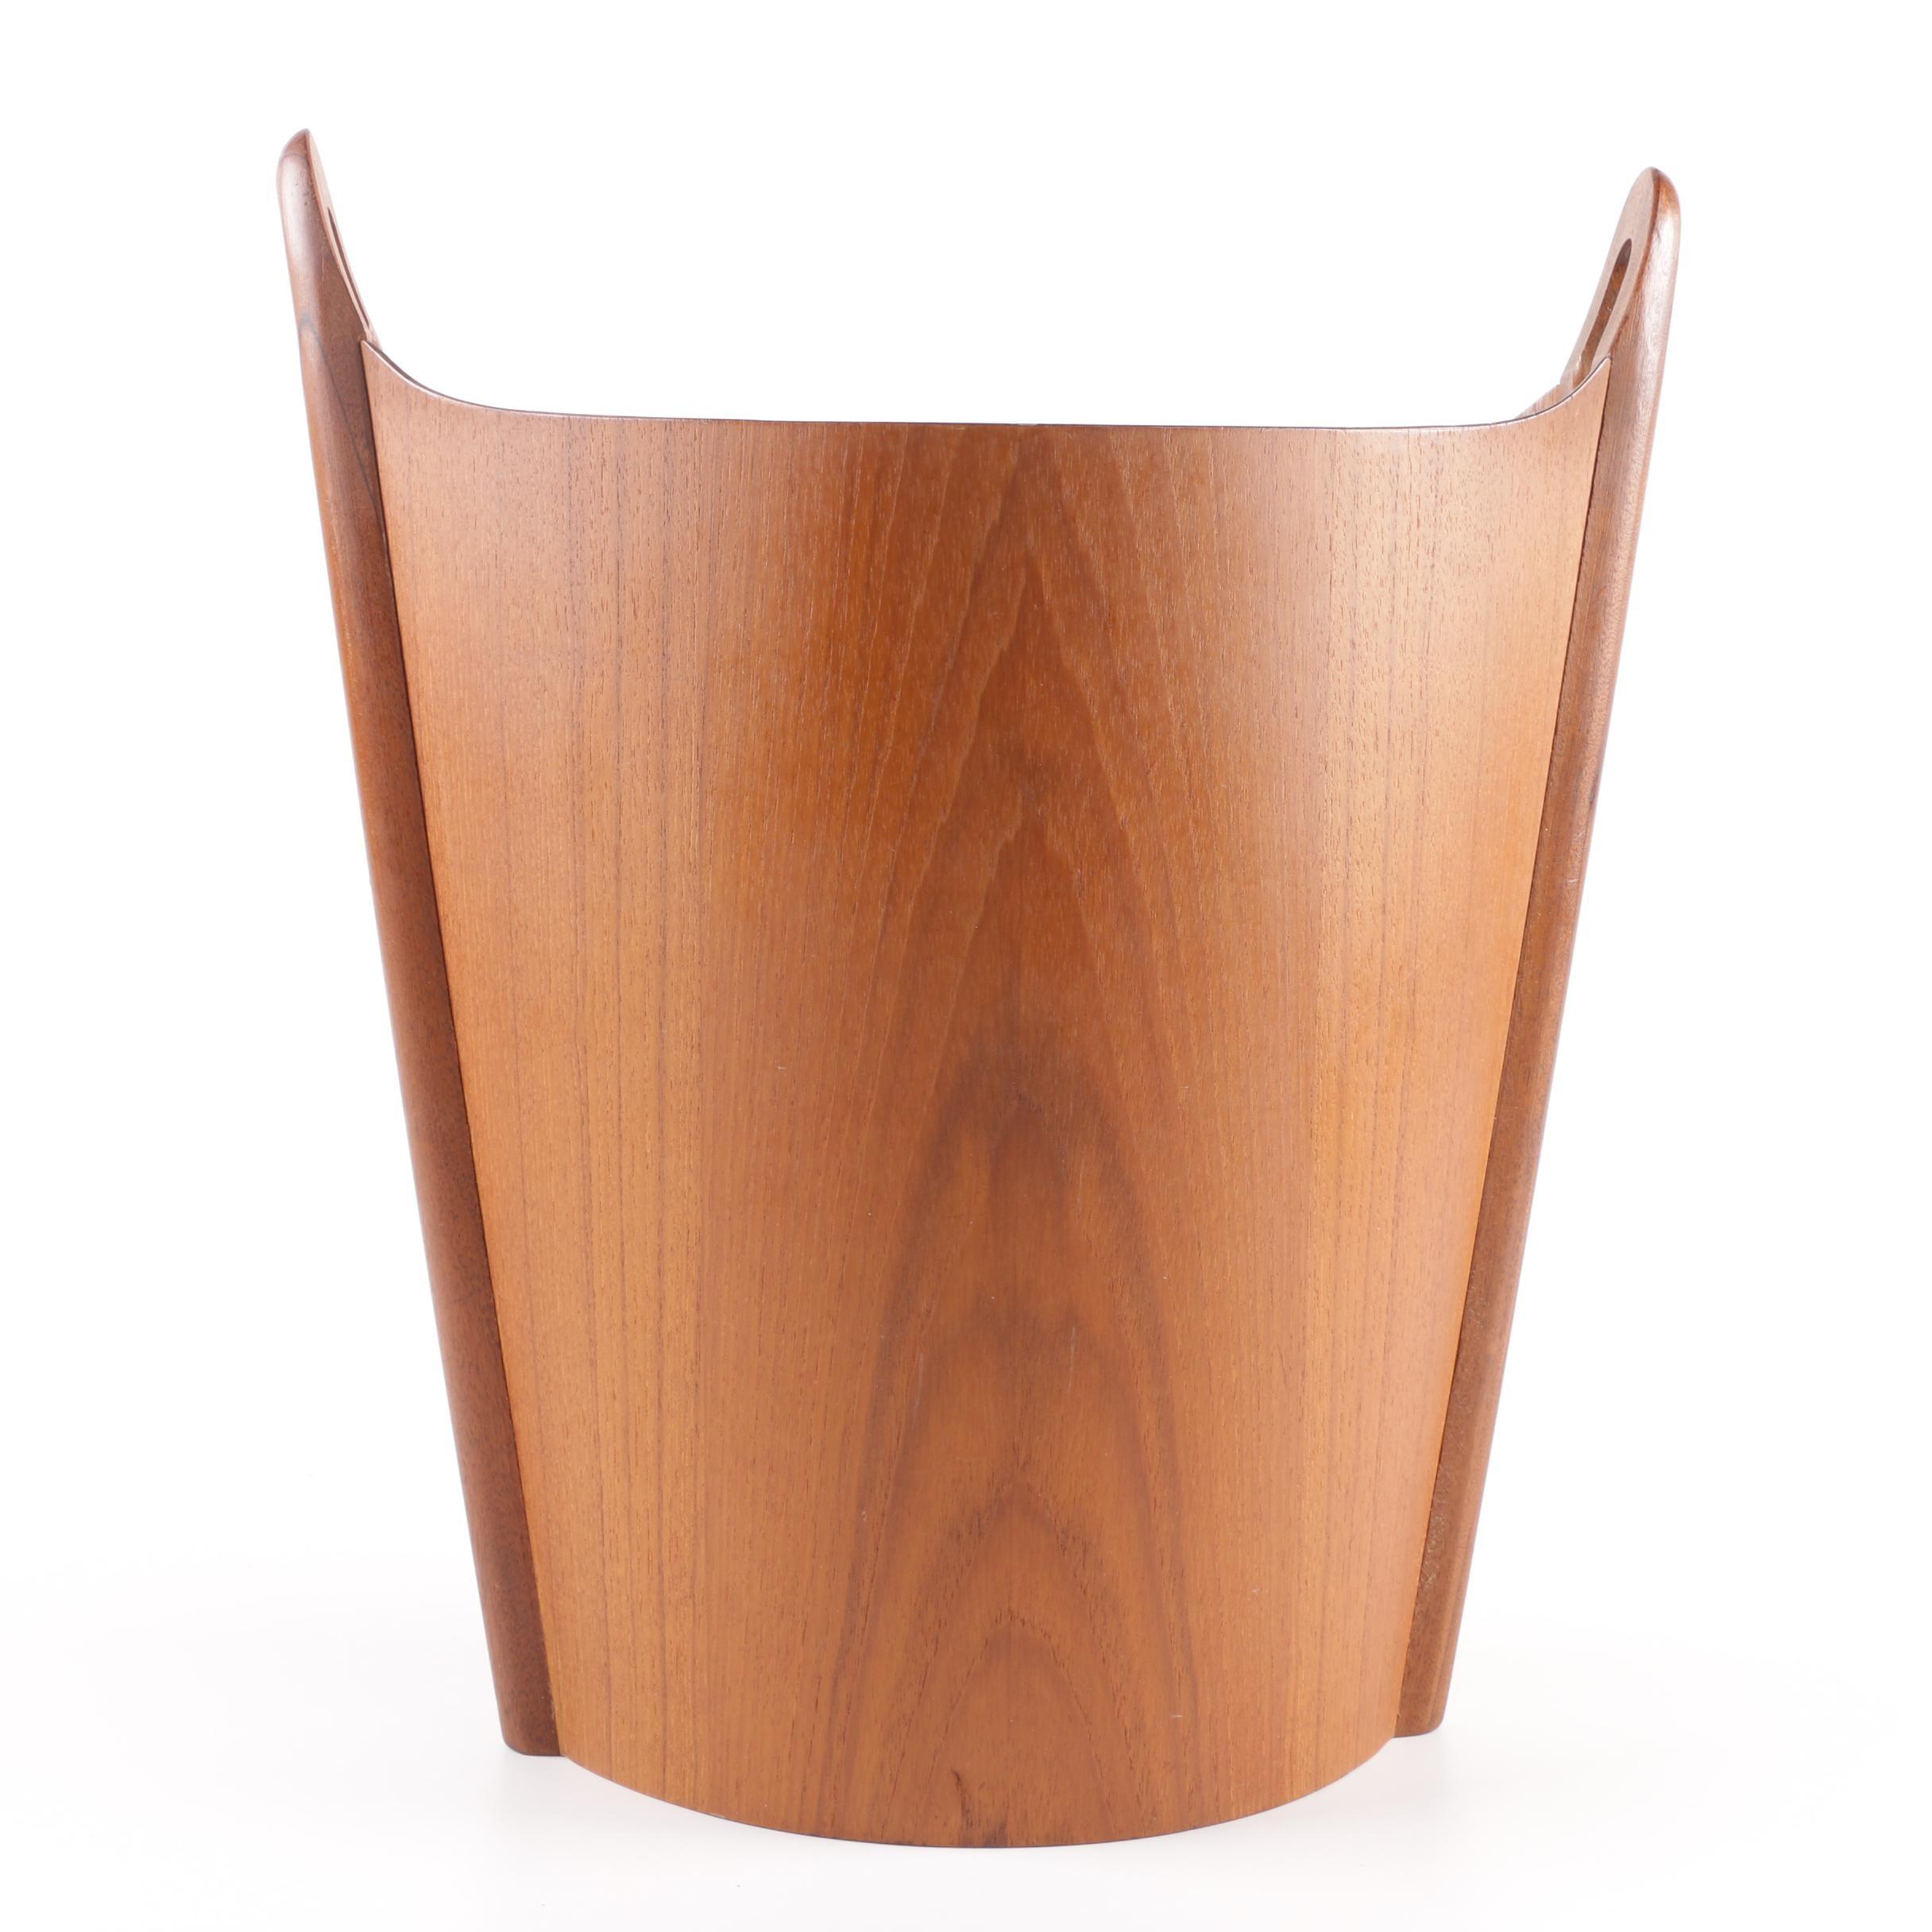 PS Heggen Mid Century Modern Teak Wood Trash Can